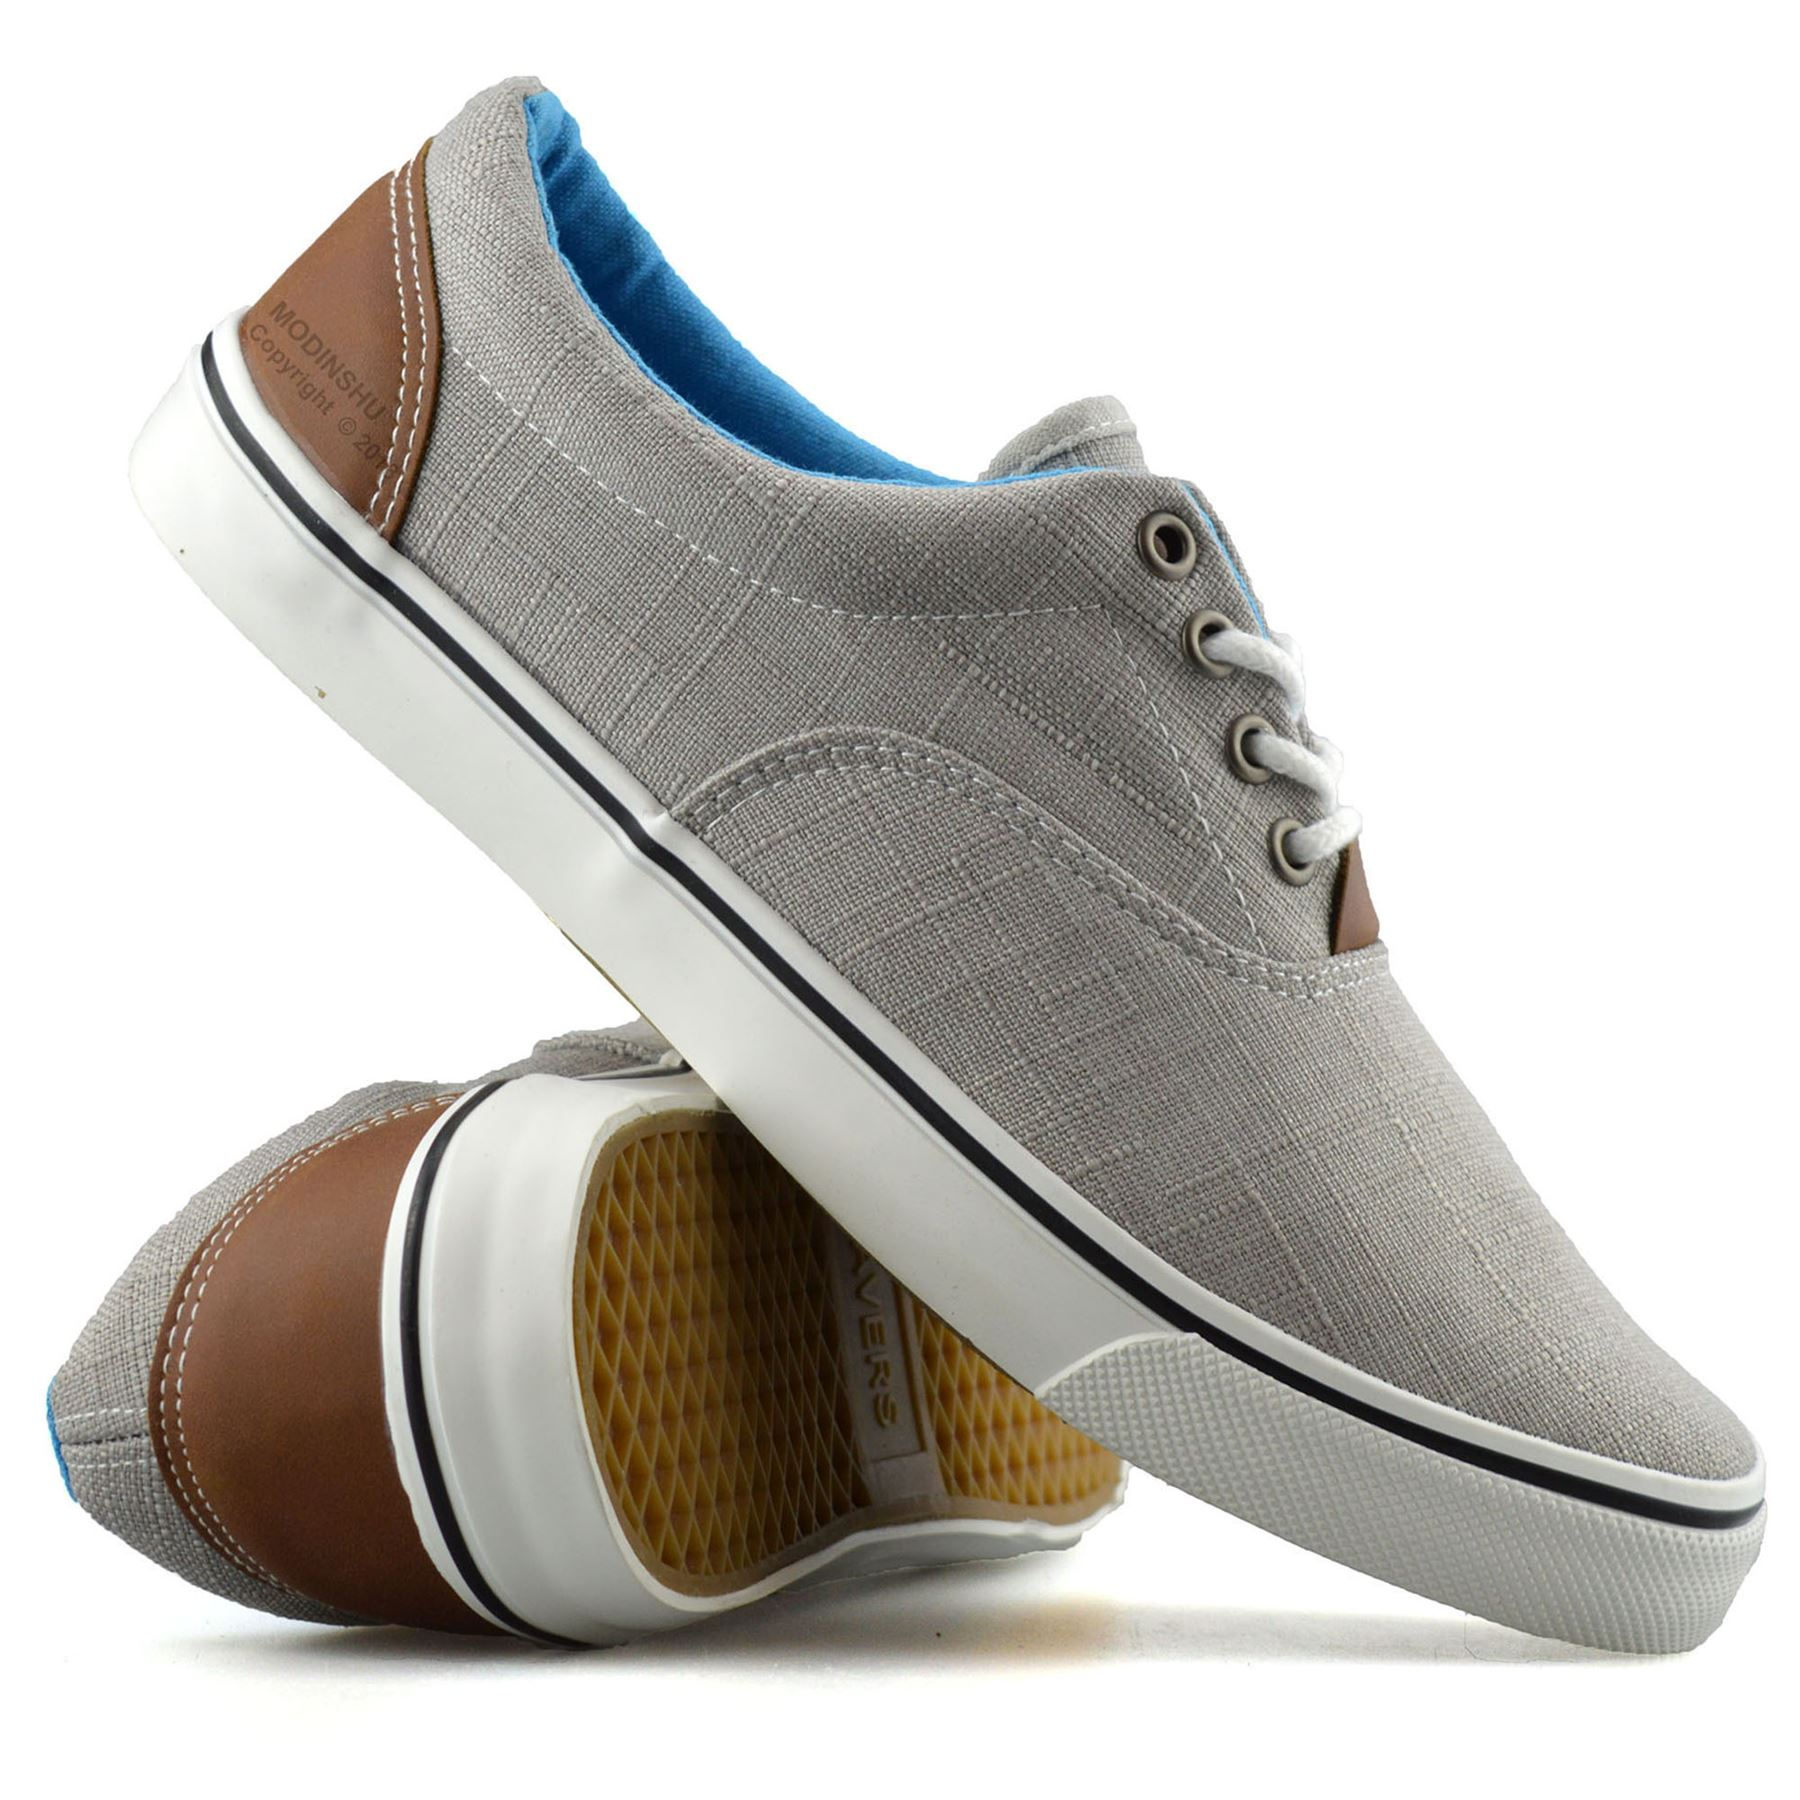 Mens Gents Casual Flat Lace Up Canvas Skate Pumps Plimsolls Trainers Shoes Size